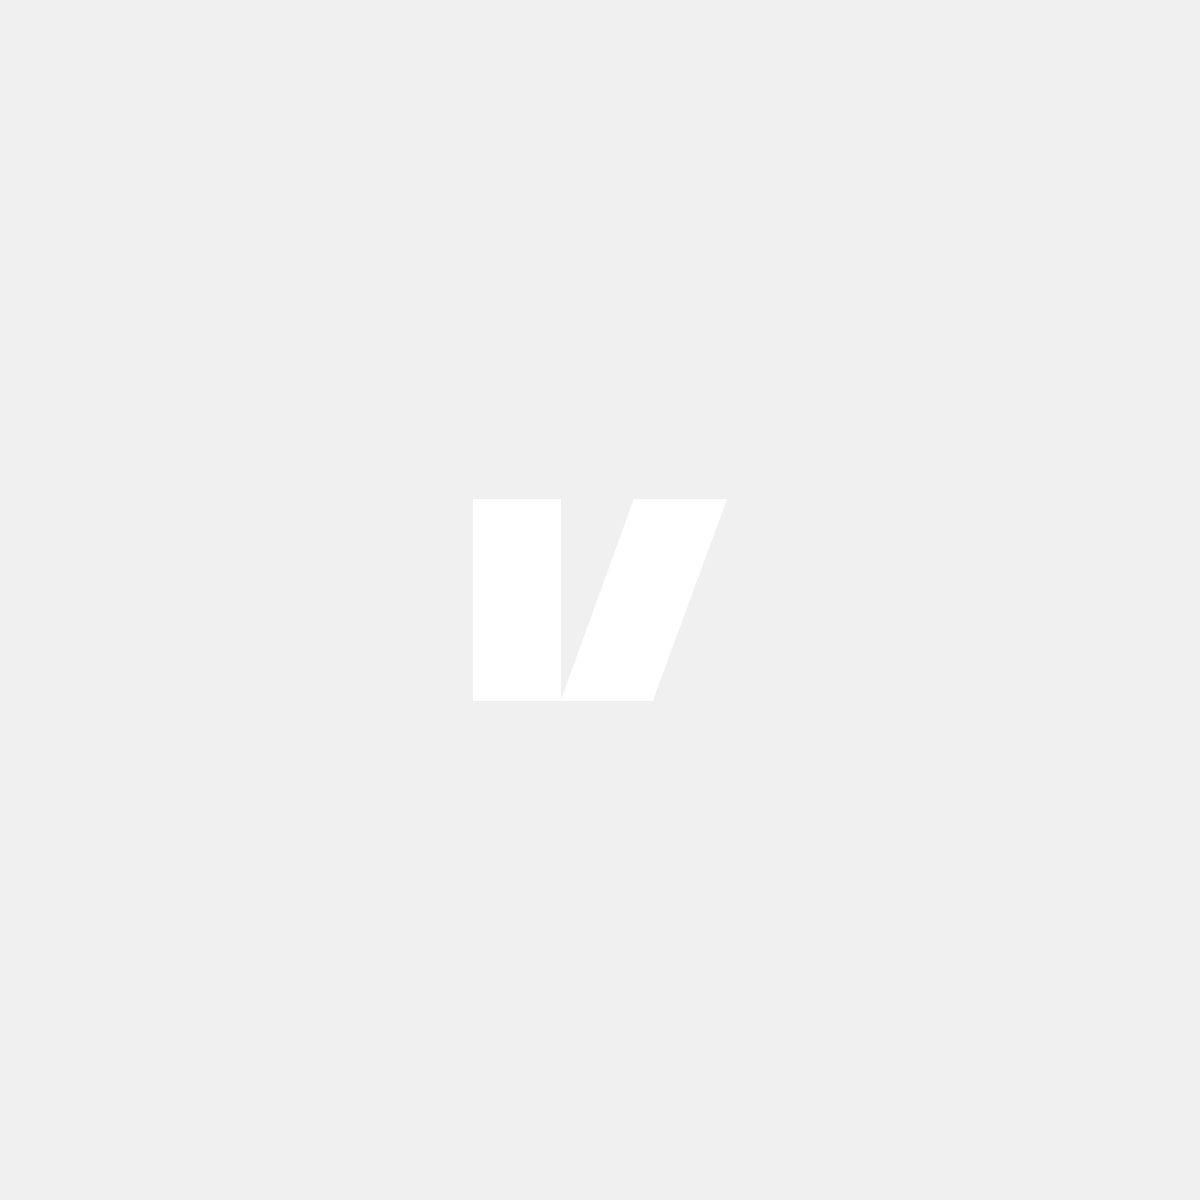 Gummimattor till Volvo V70, XC70 08-, soft beige